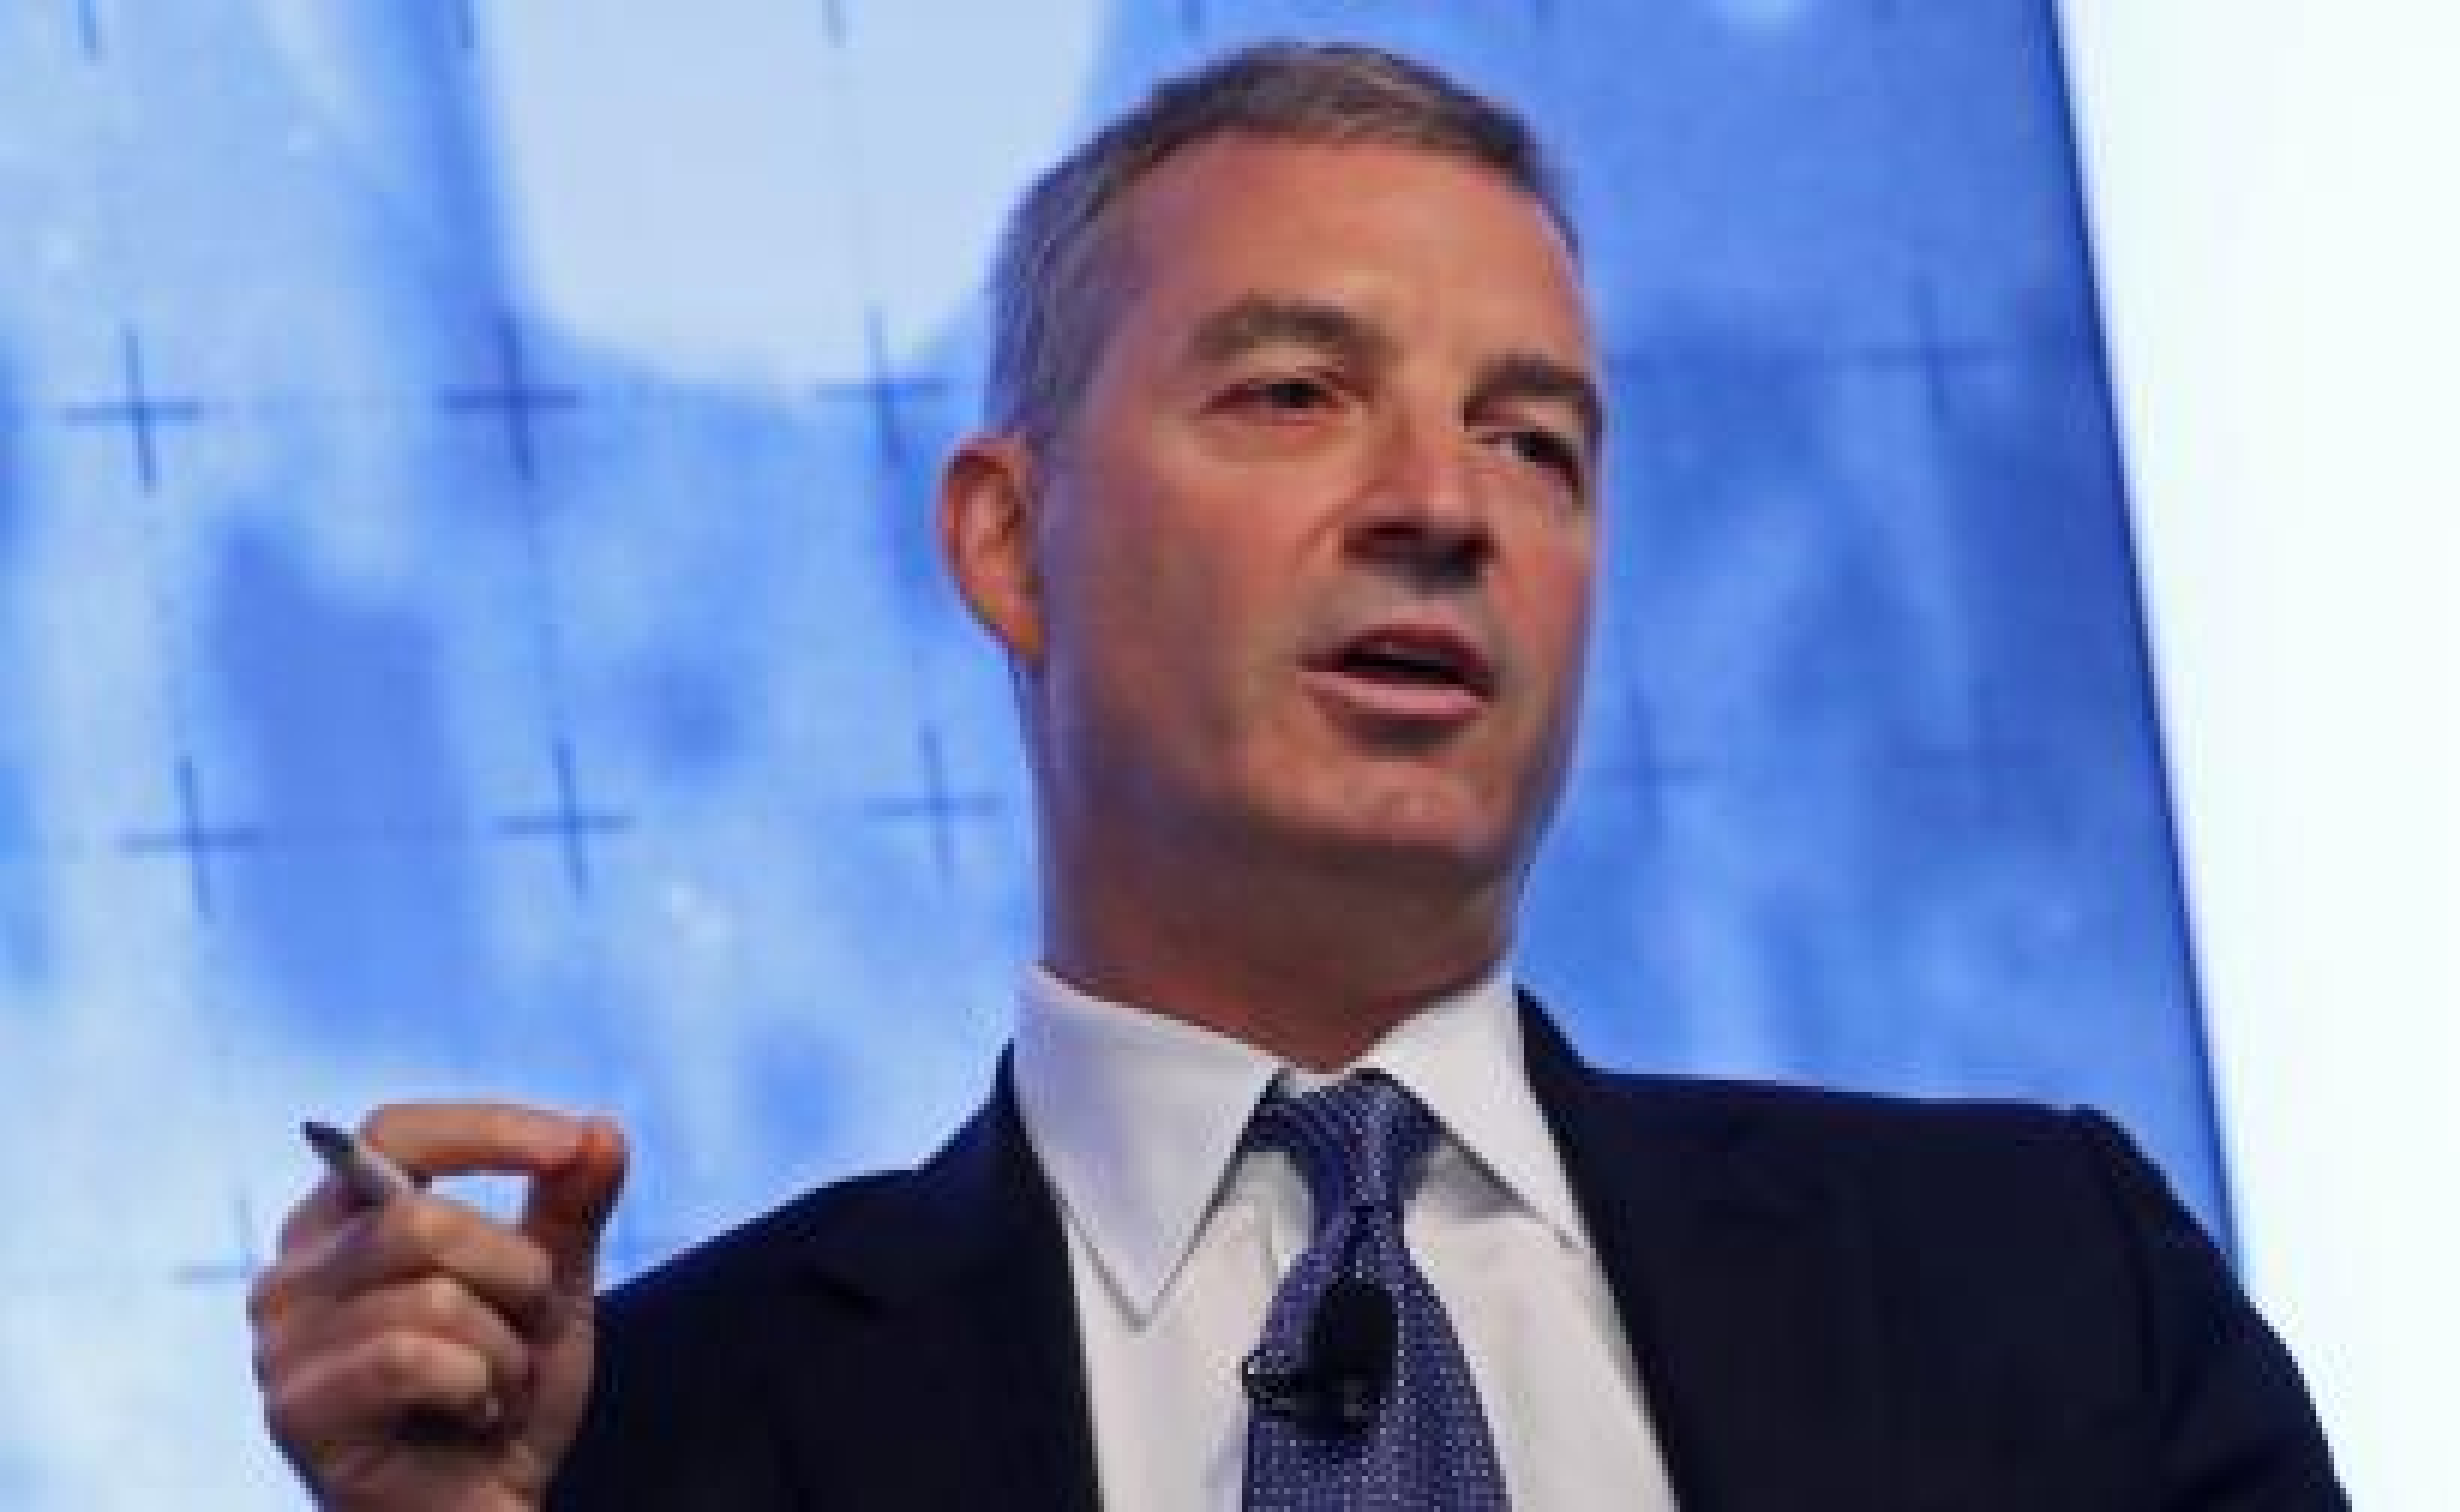 Daniel Loeb sent inflammatory emails to NYC deputy mayor Richard Buery